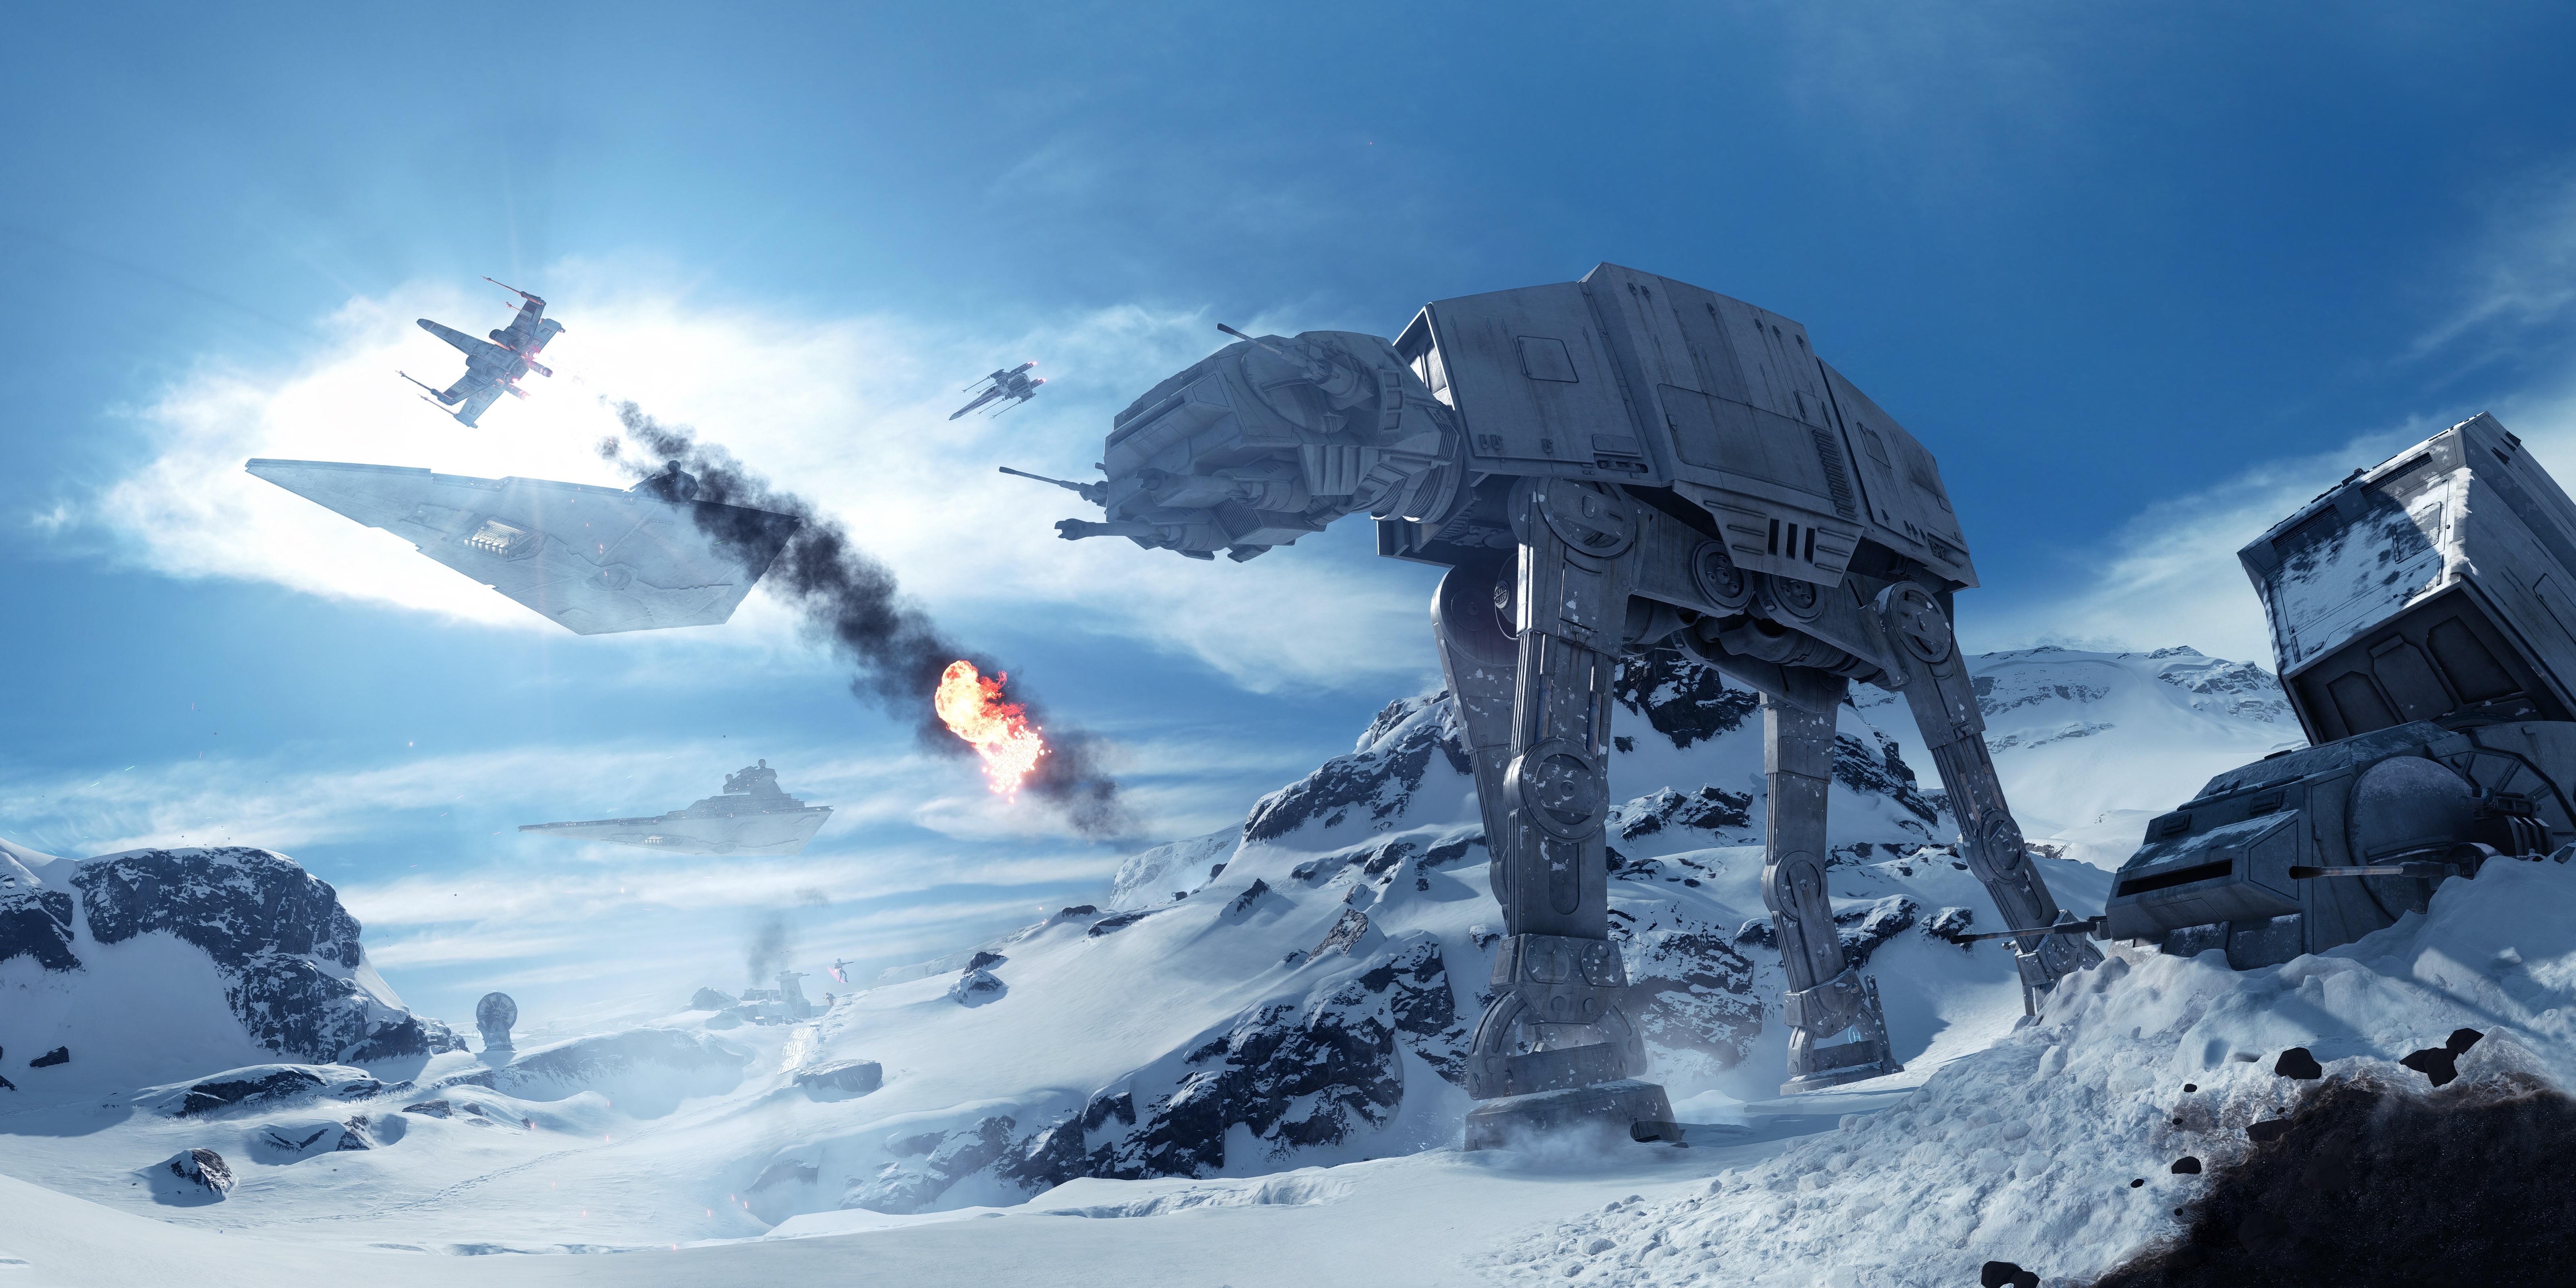 Star Wars Battlefront (2015) 5k Retina Ultra HD Wallpaper